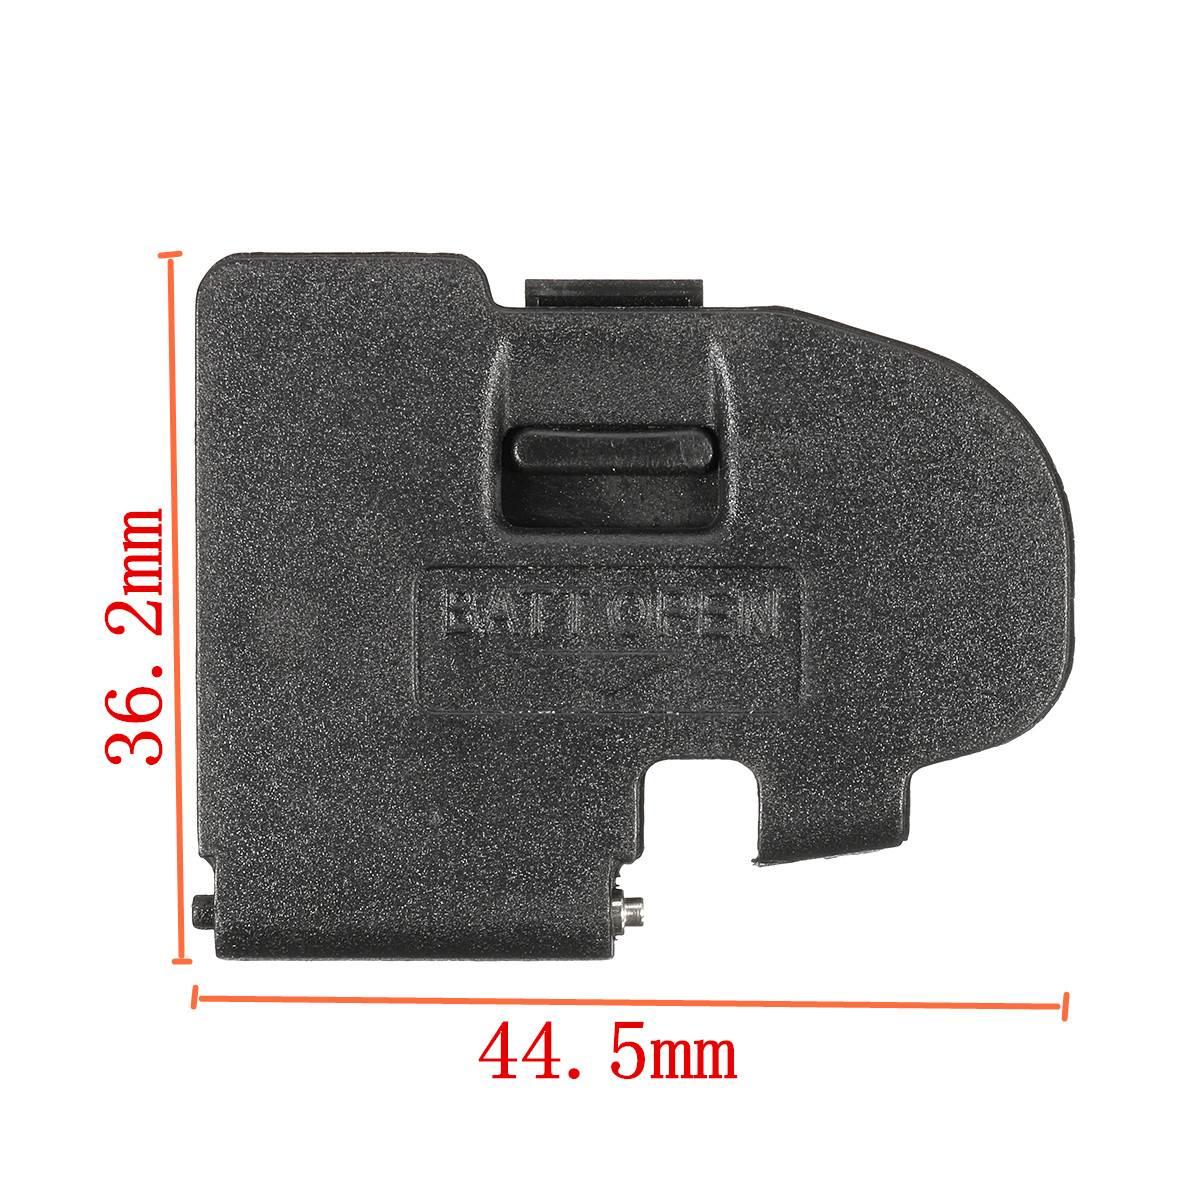 2018 New Arrival Replacement Battery Door Case Lid Cover Cap Repair Part For Canon EOS 5D